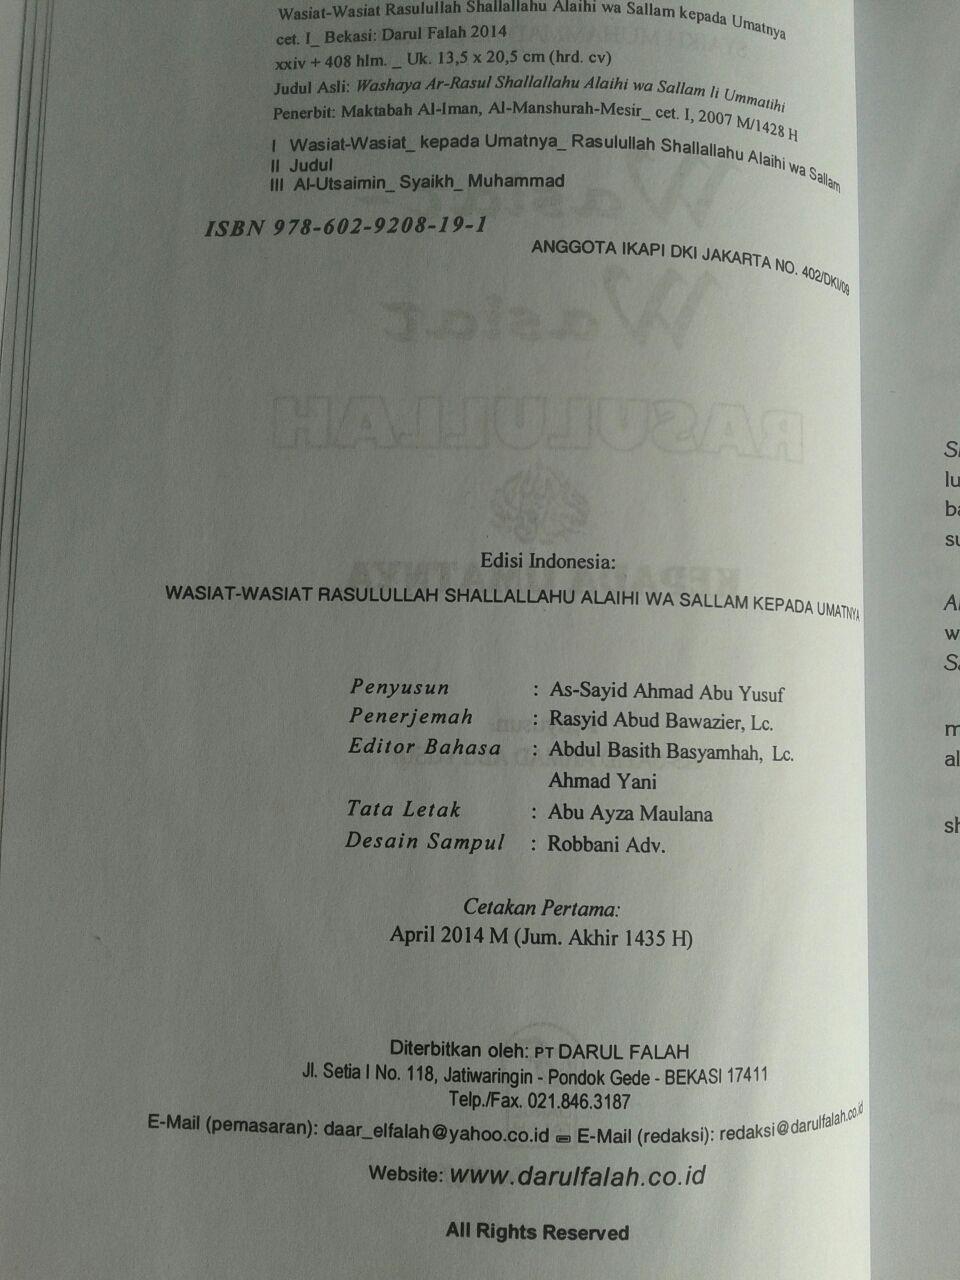 Buku Wasiat-Wasiat Rasulullah Kepada Umatnya isi 3